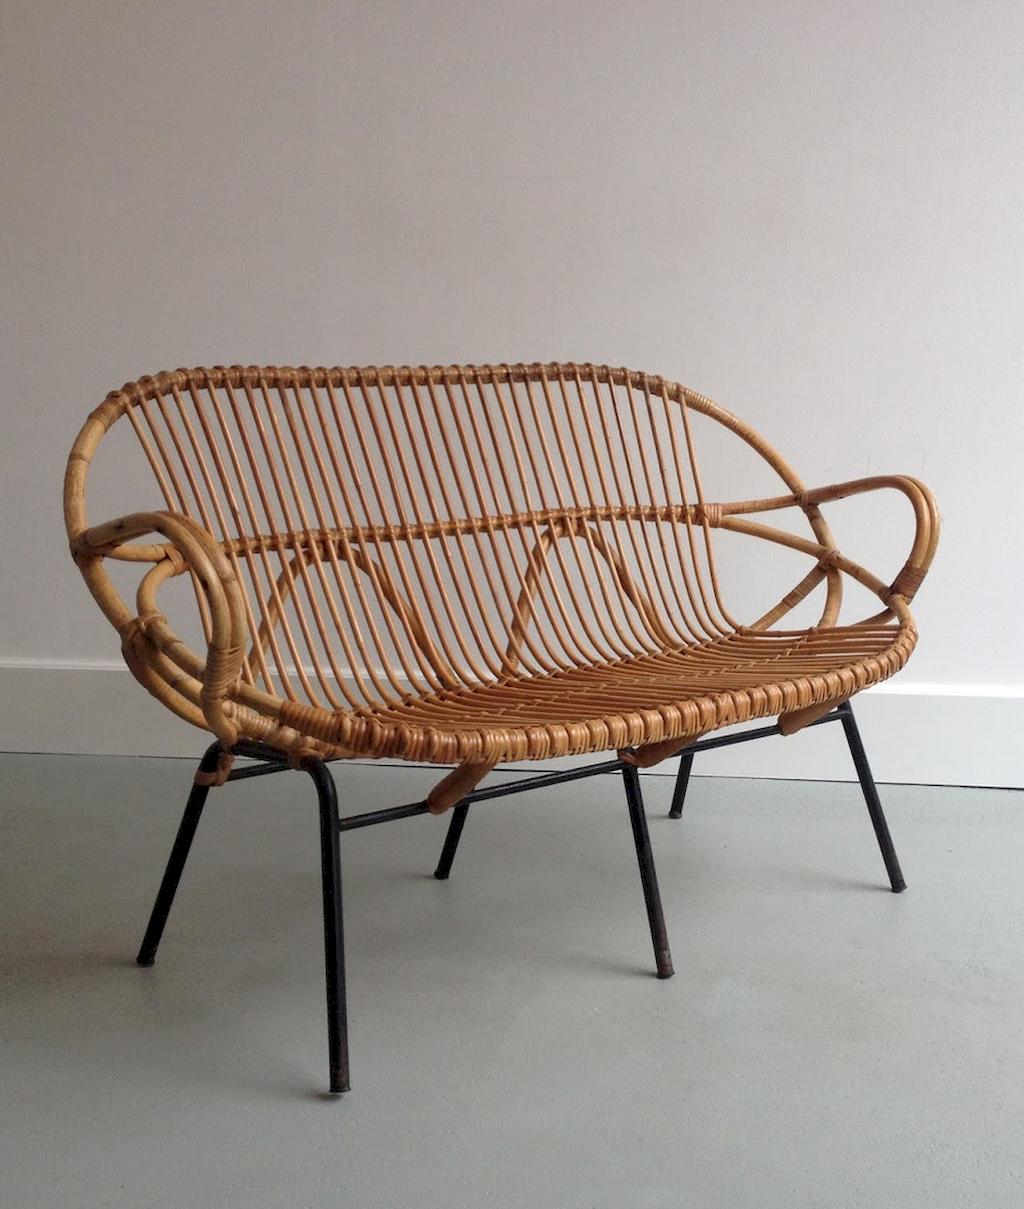 Rattan Furniture127